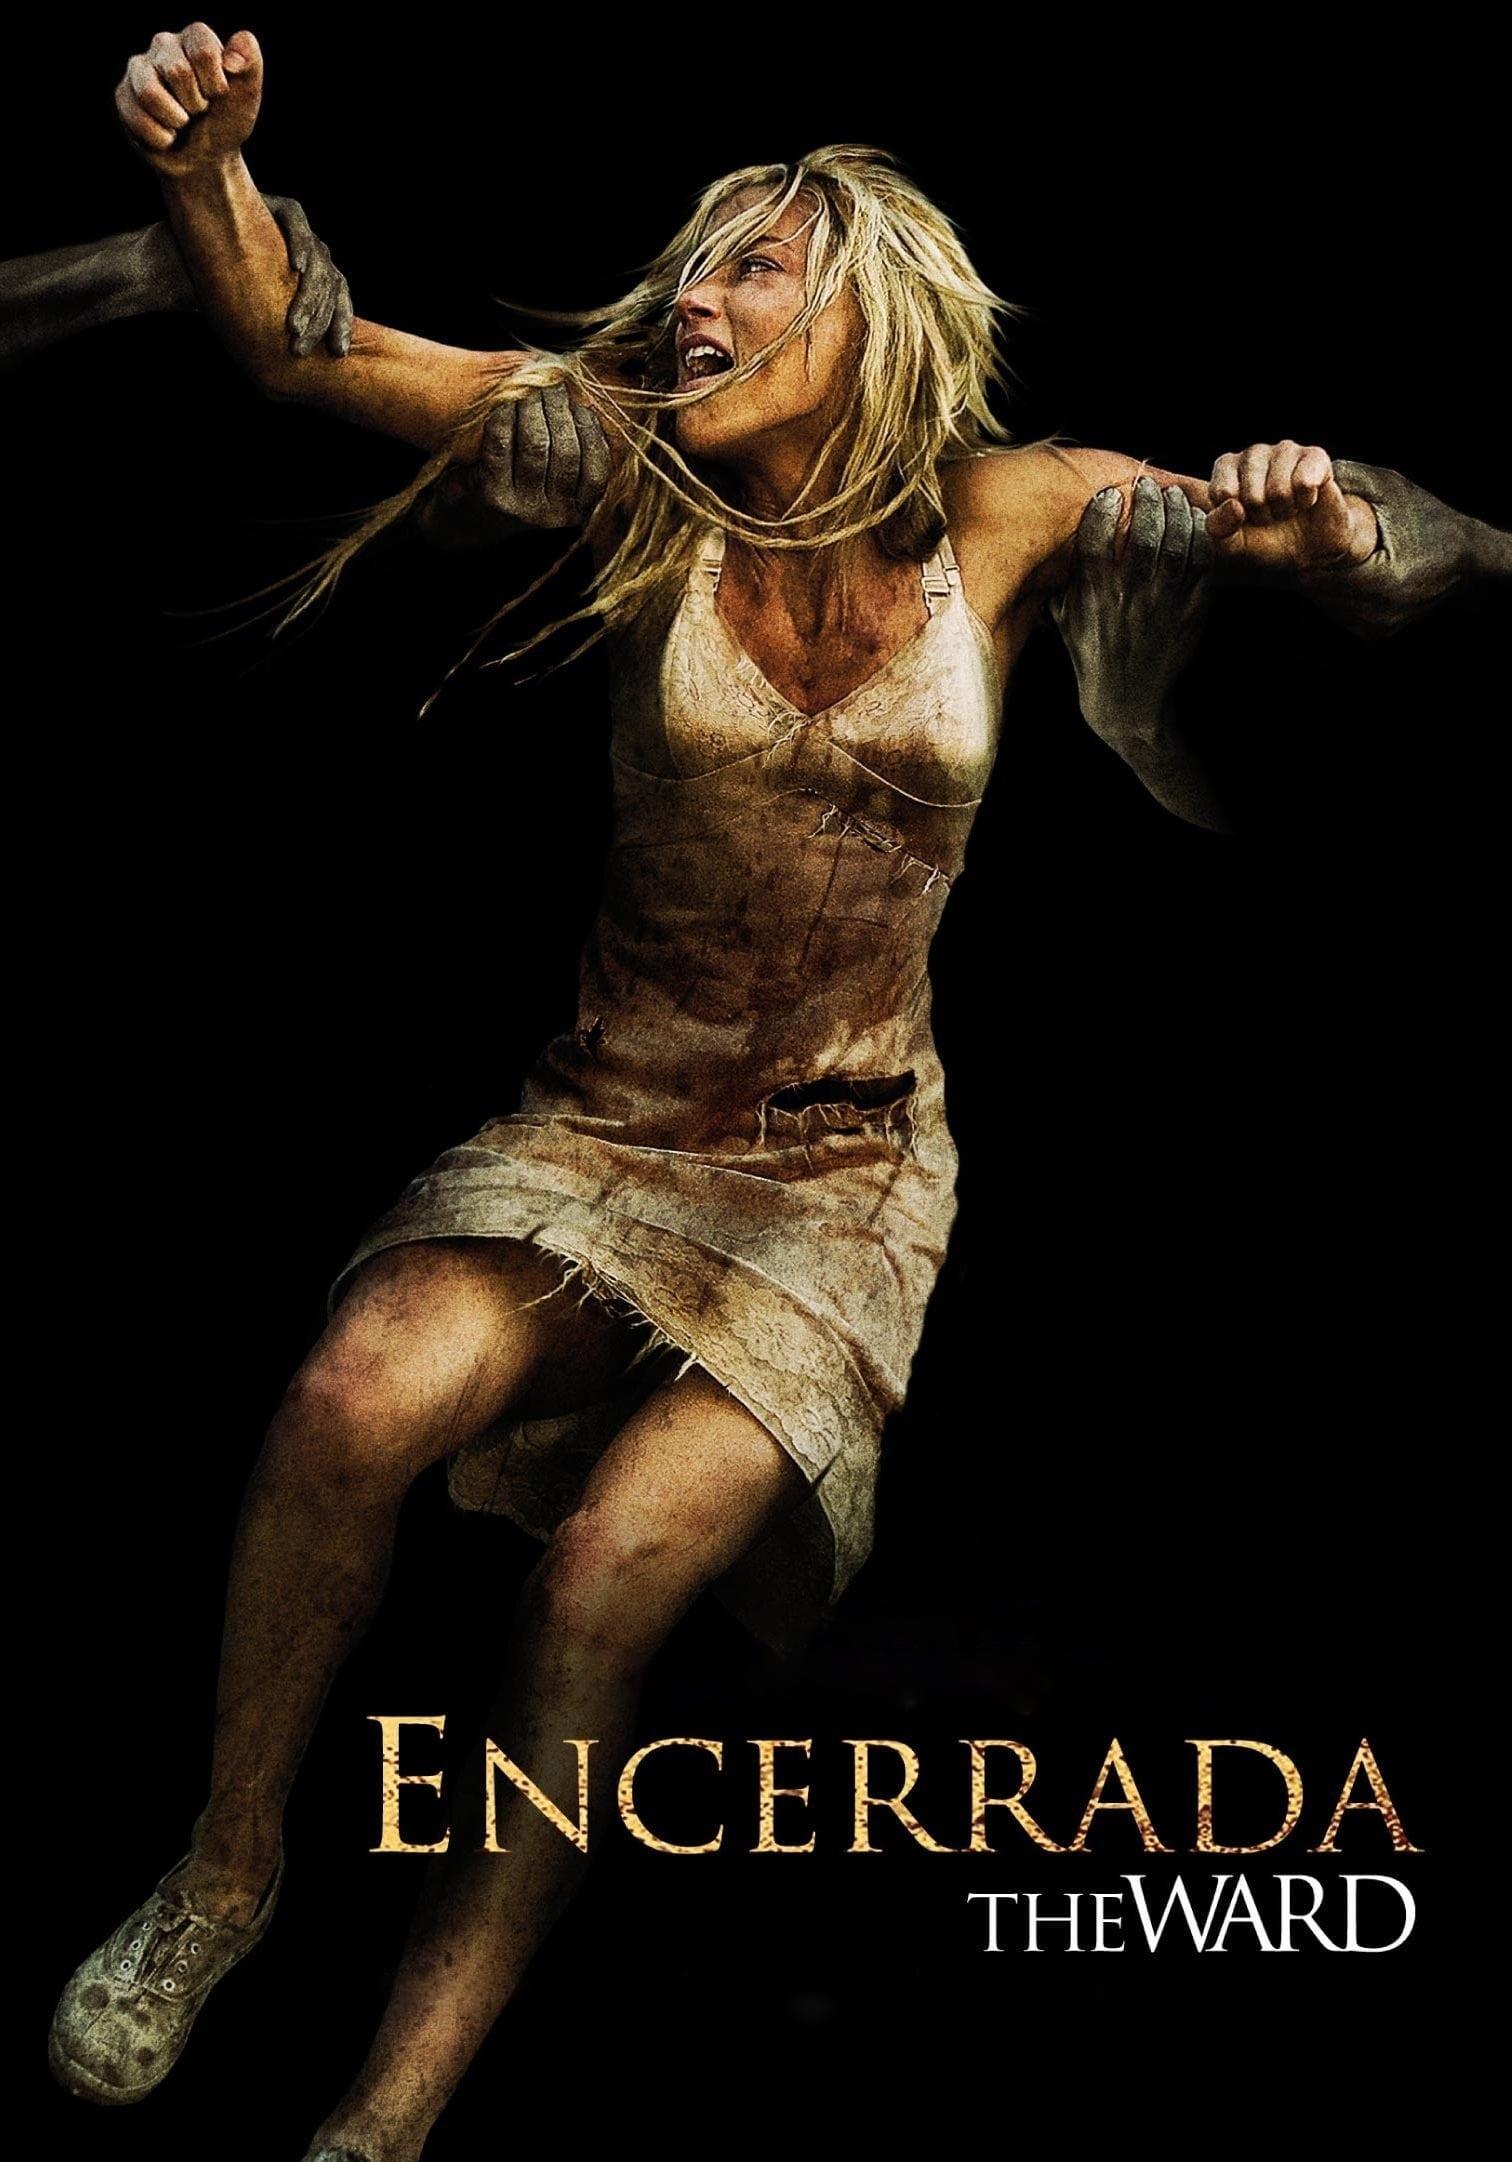 Encerrada (The Ward) poster